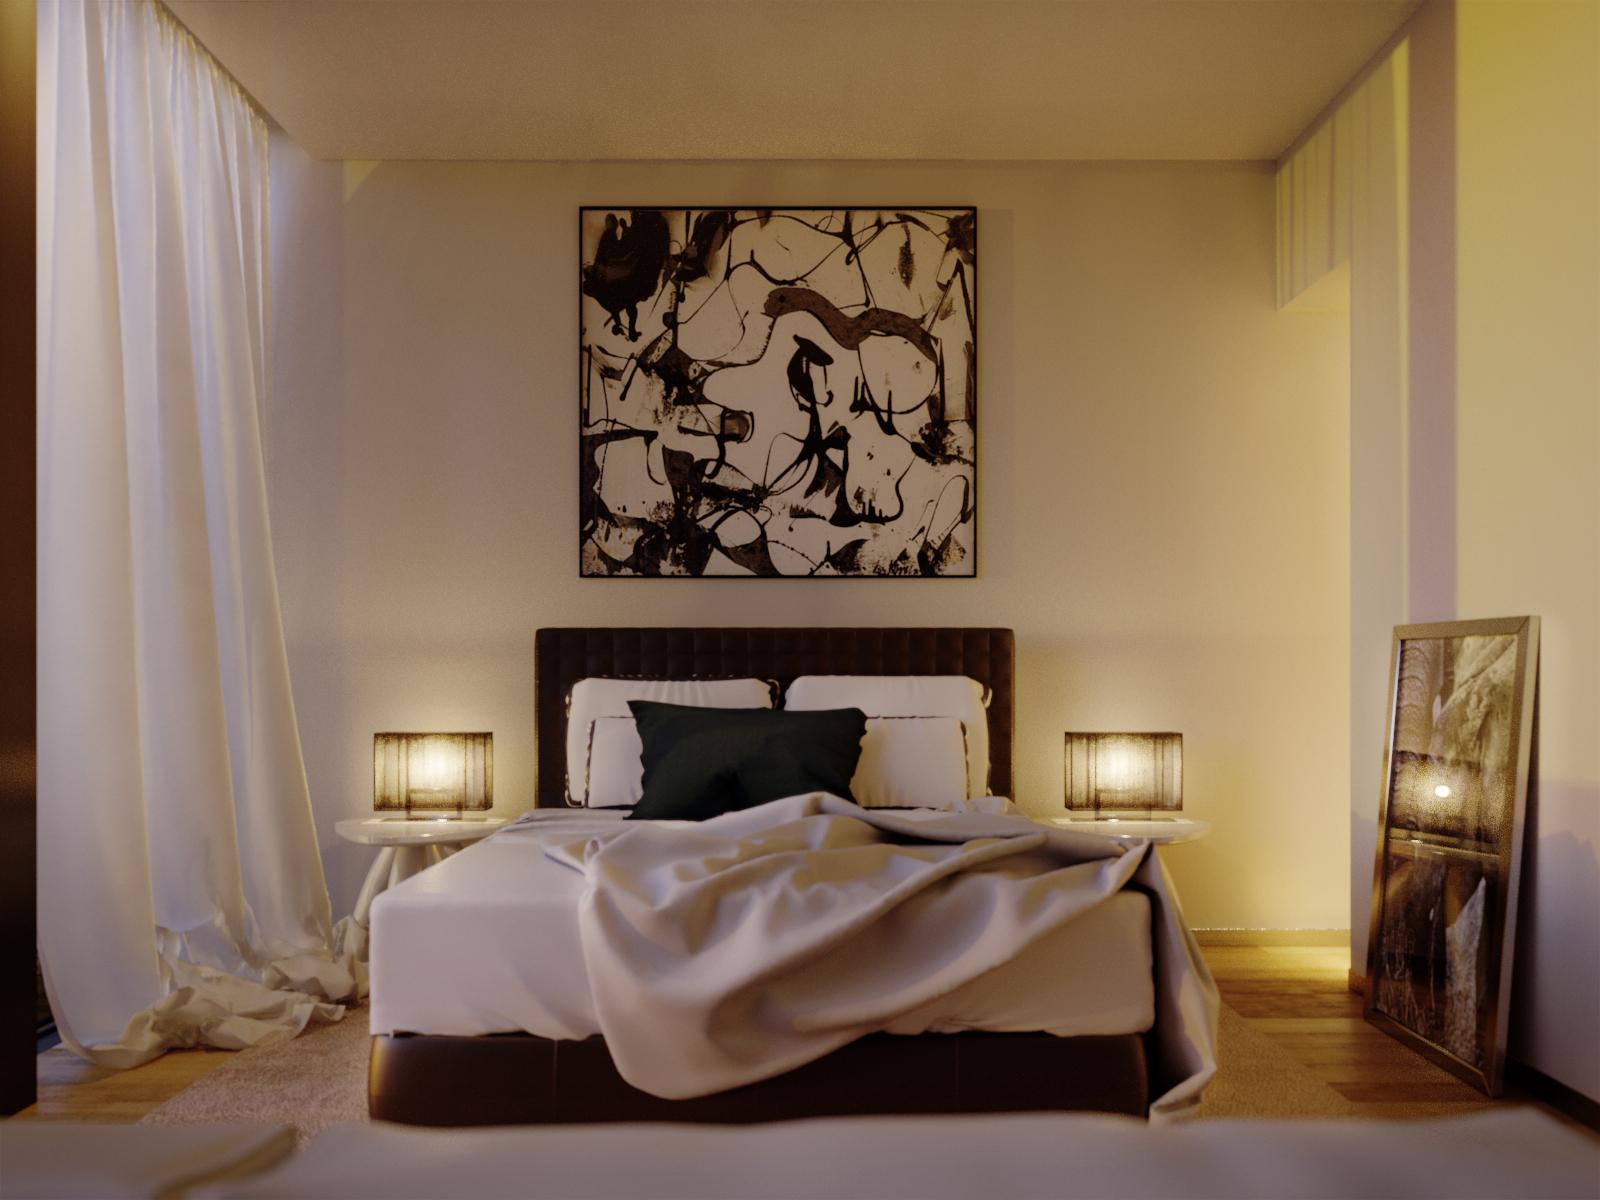 lighting and rendering the corona render c4d interior scene lesterbanks. Black Bedroom Furniture Sets. Home Design Ideas